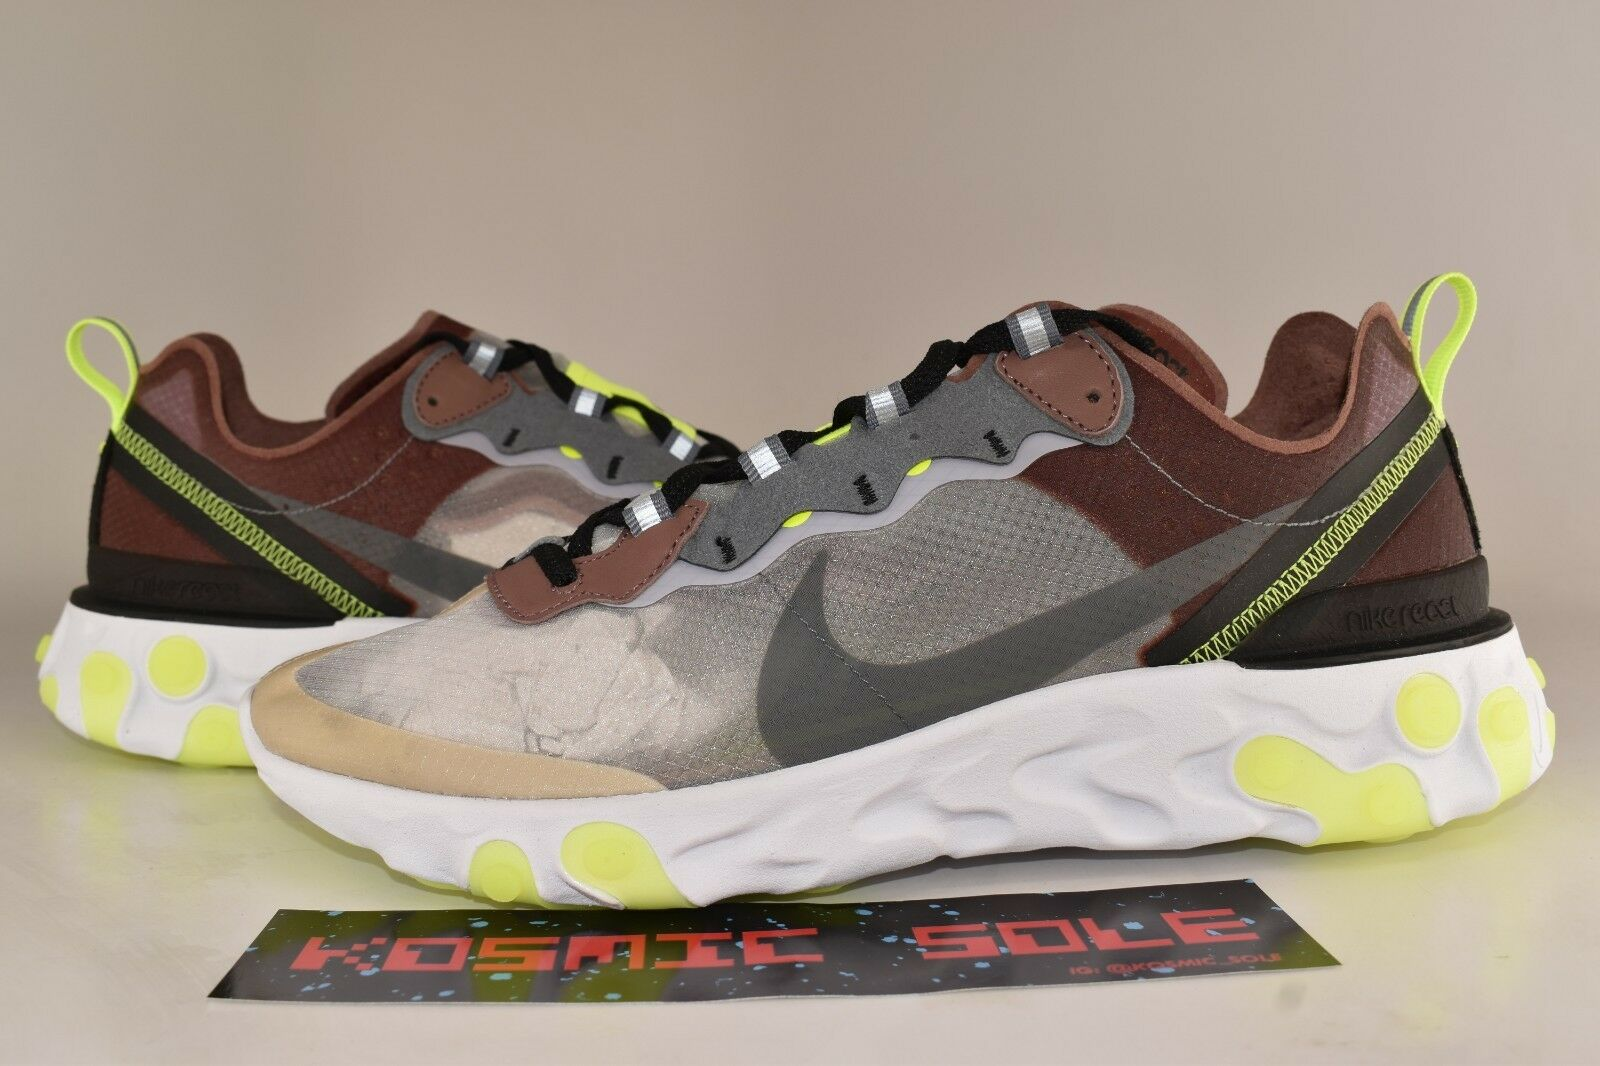 Nike React Element 87 Desert Sand Style AQ1090-002 Size 6.5